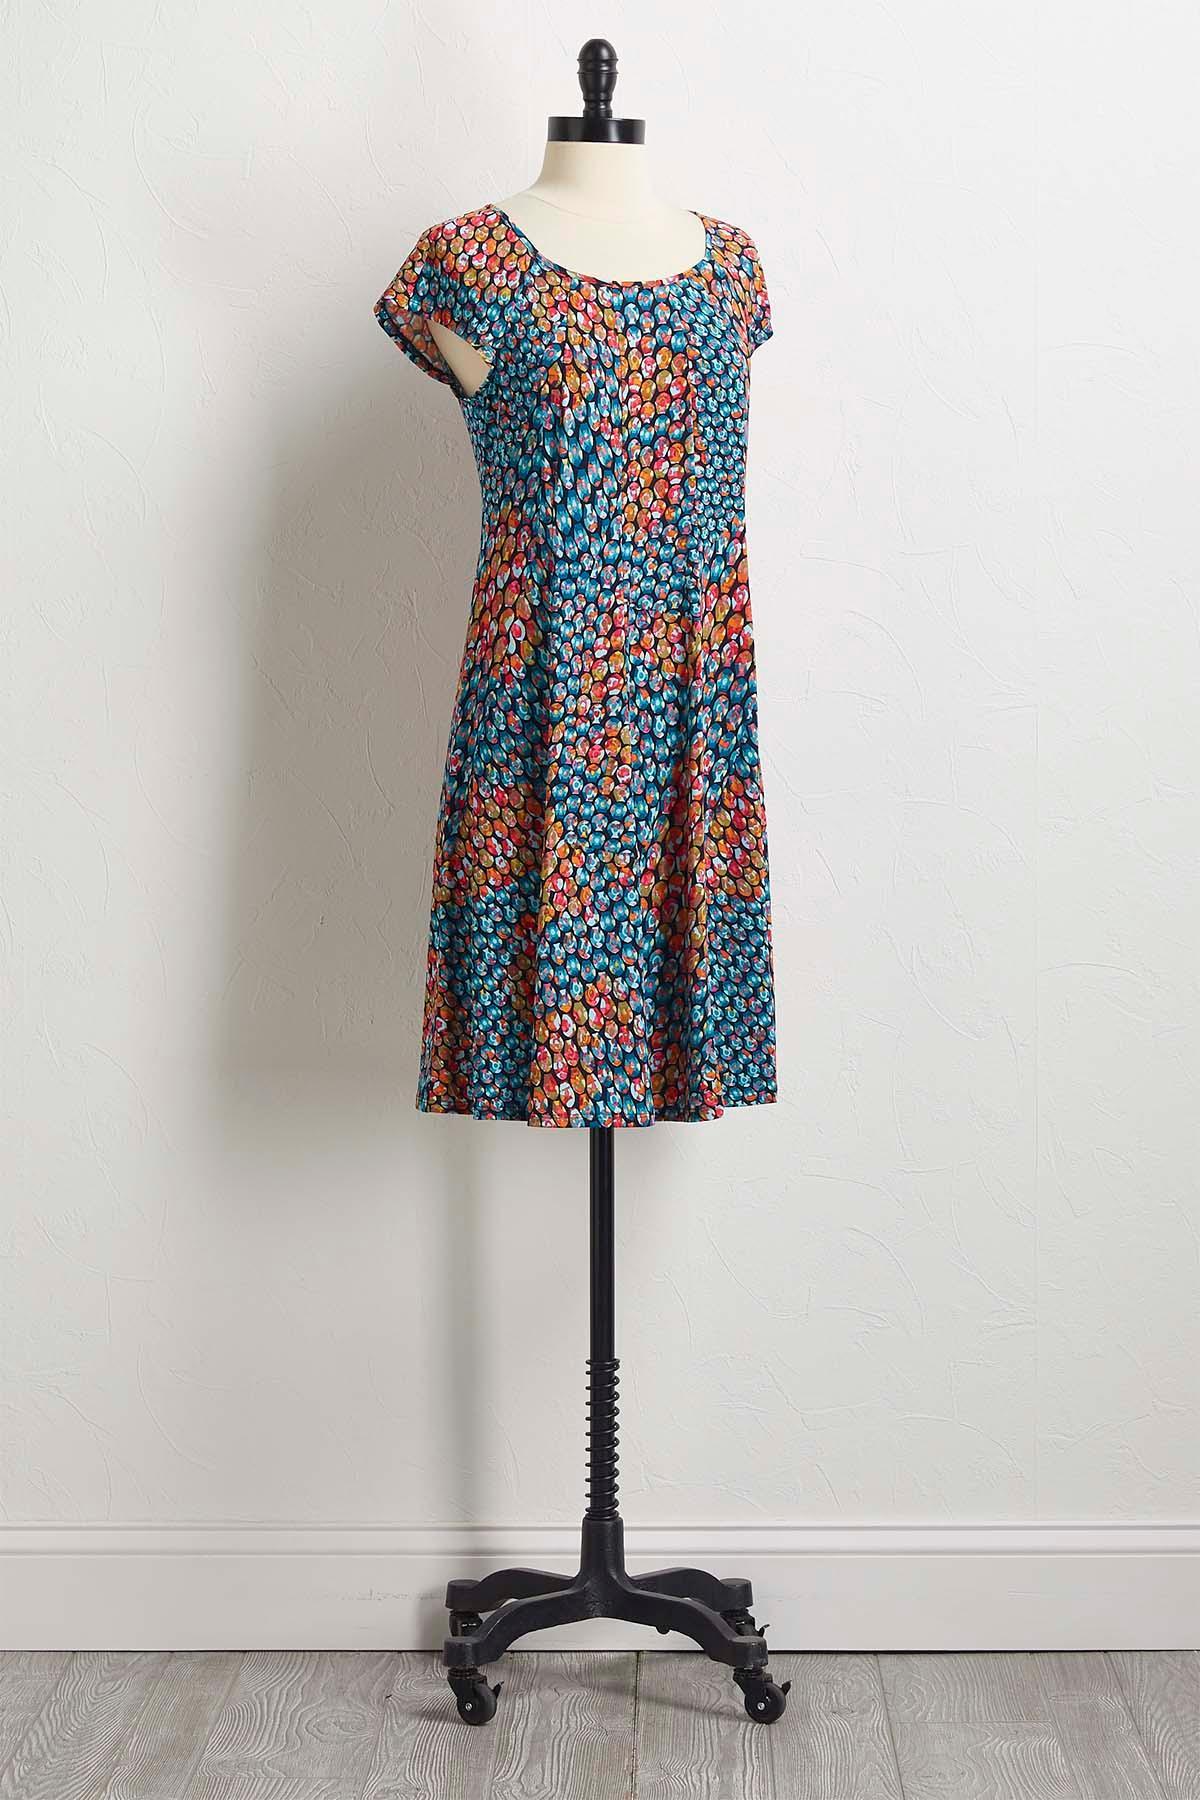 Teal Peacock Shift Dress